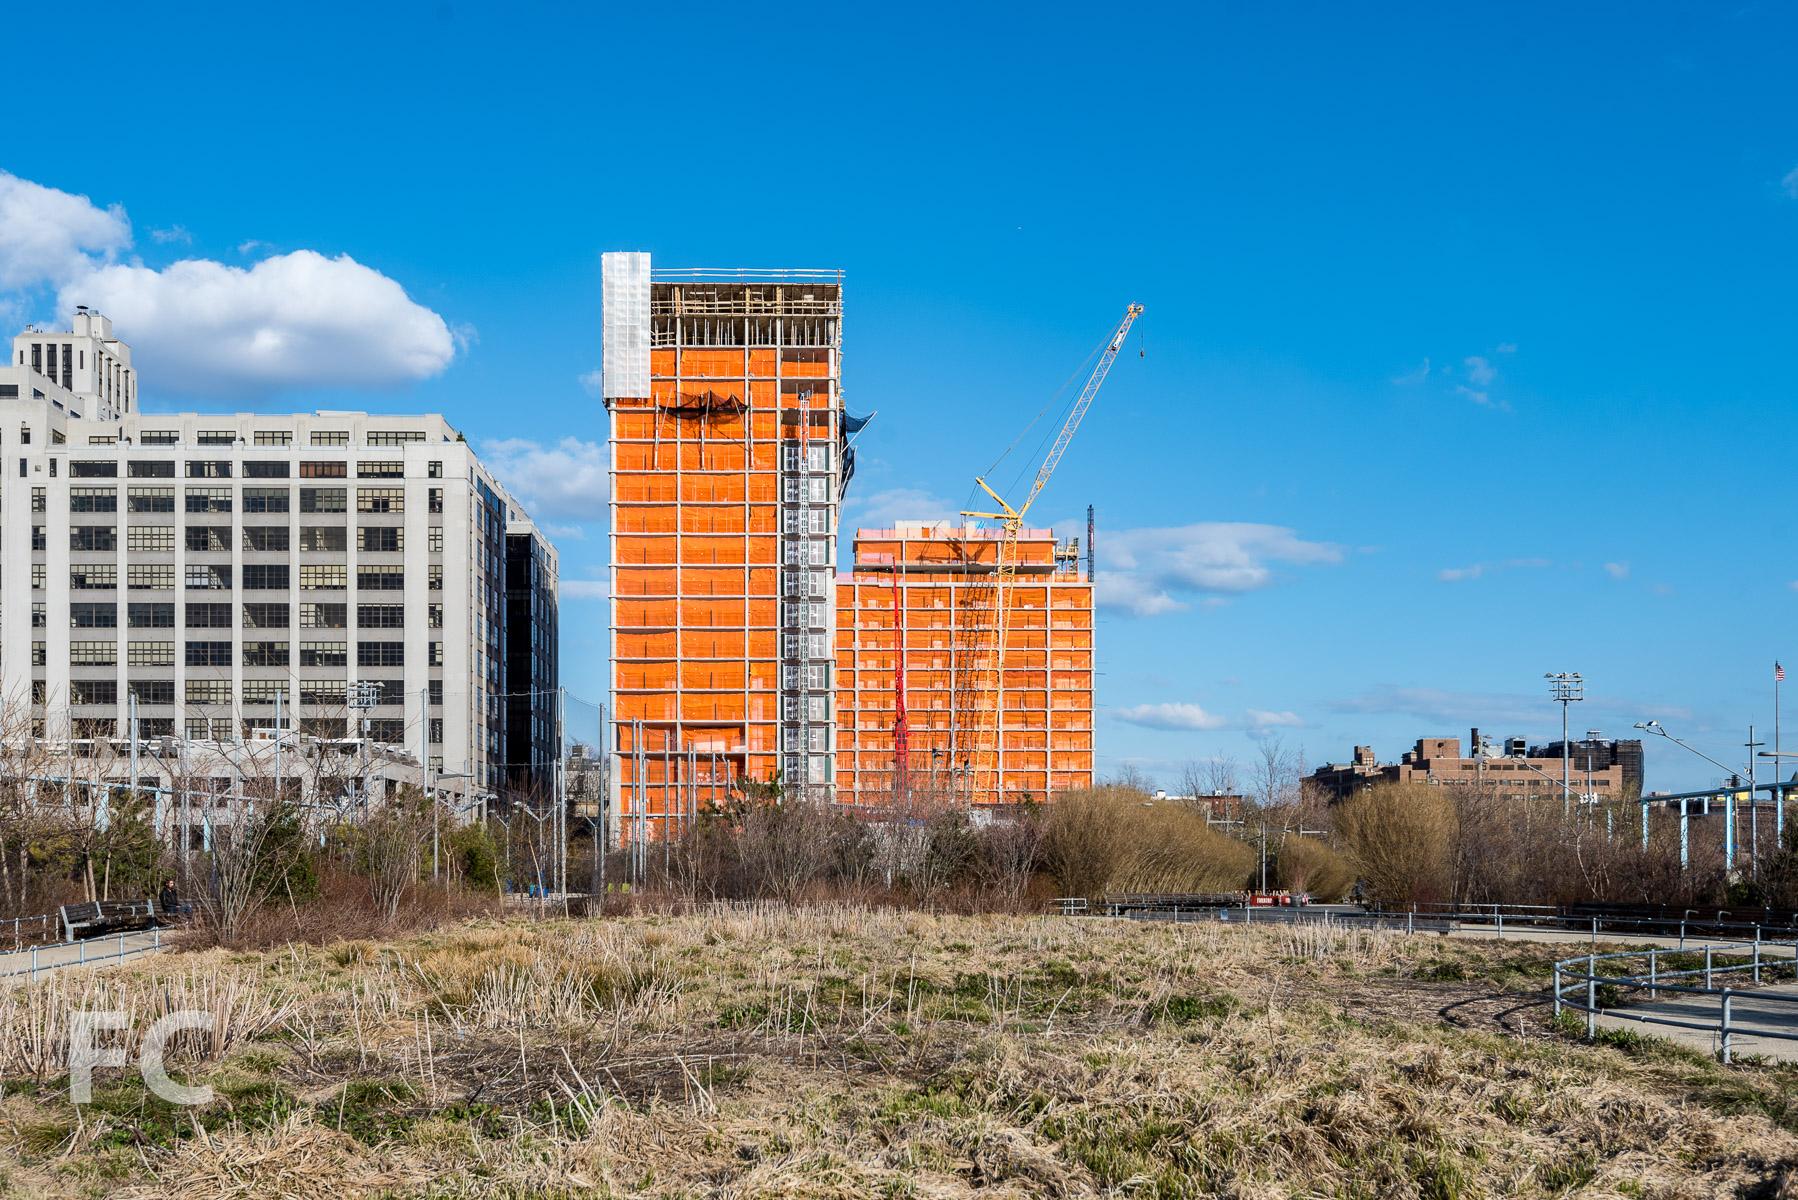 West facade of 15 Bridge Park Drive (right) and 50 Bridge Park Drive (left) from Pier 6 at Brooklyn Bridge Park.